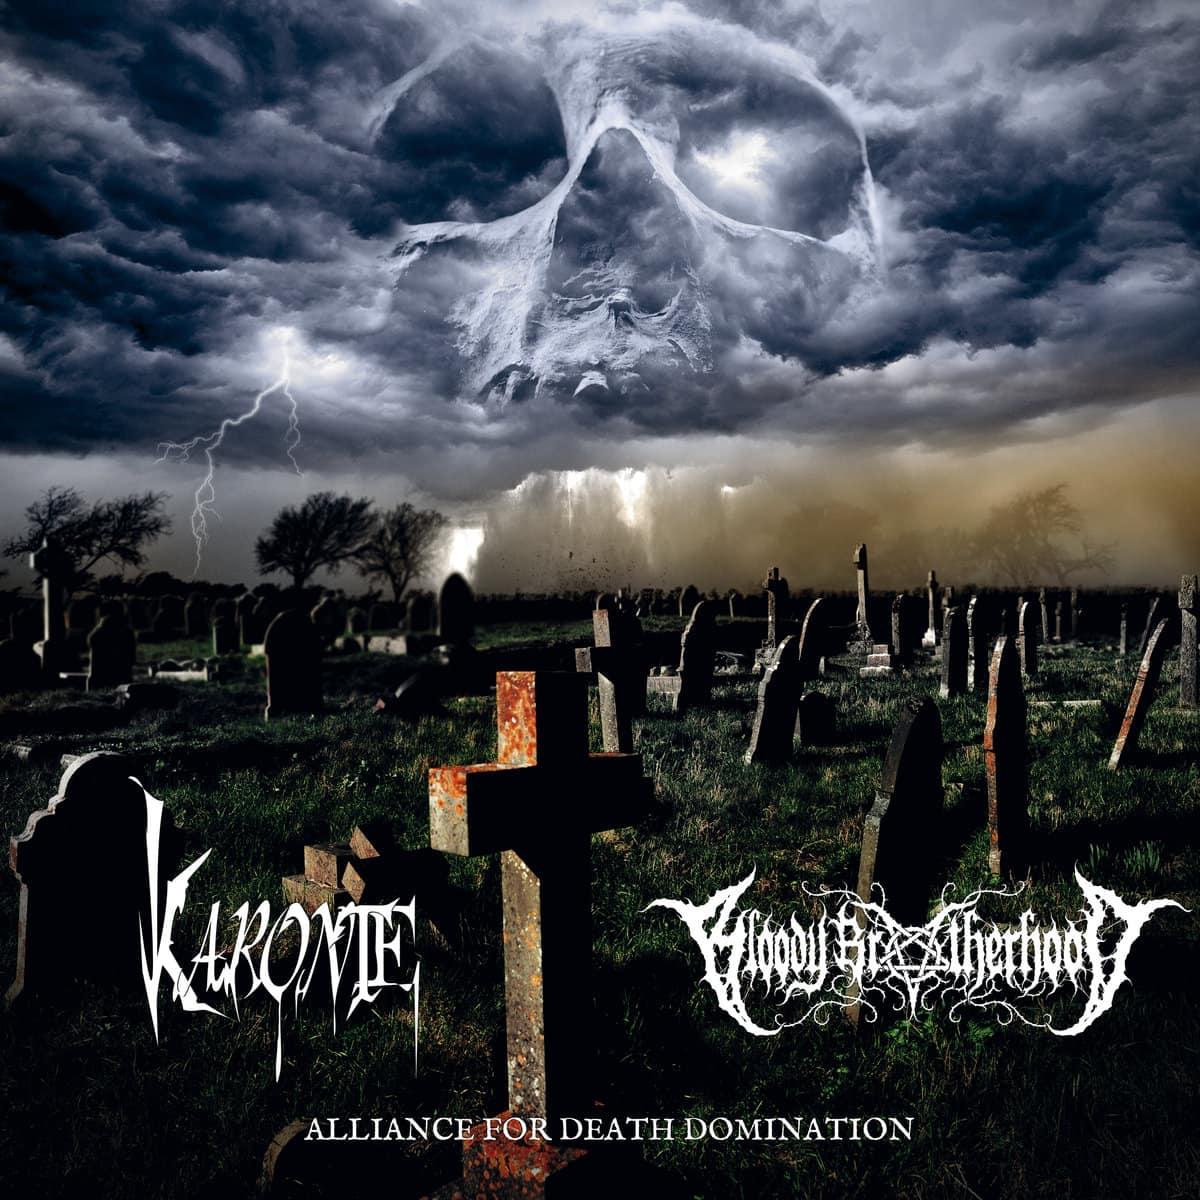 KARONTE & BLOODY BROTHERHOOD – Alliance for death domination, 2017